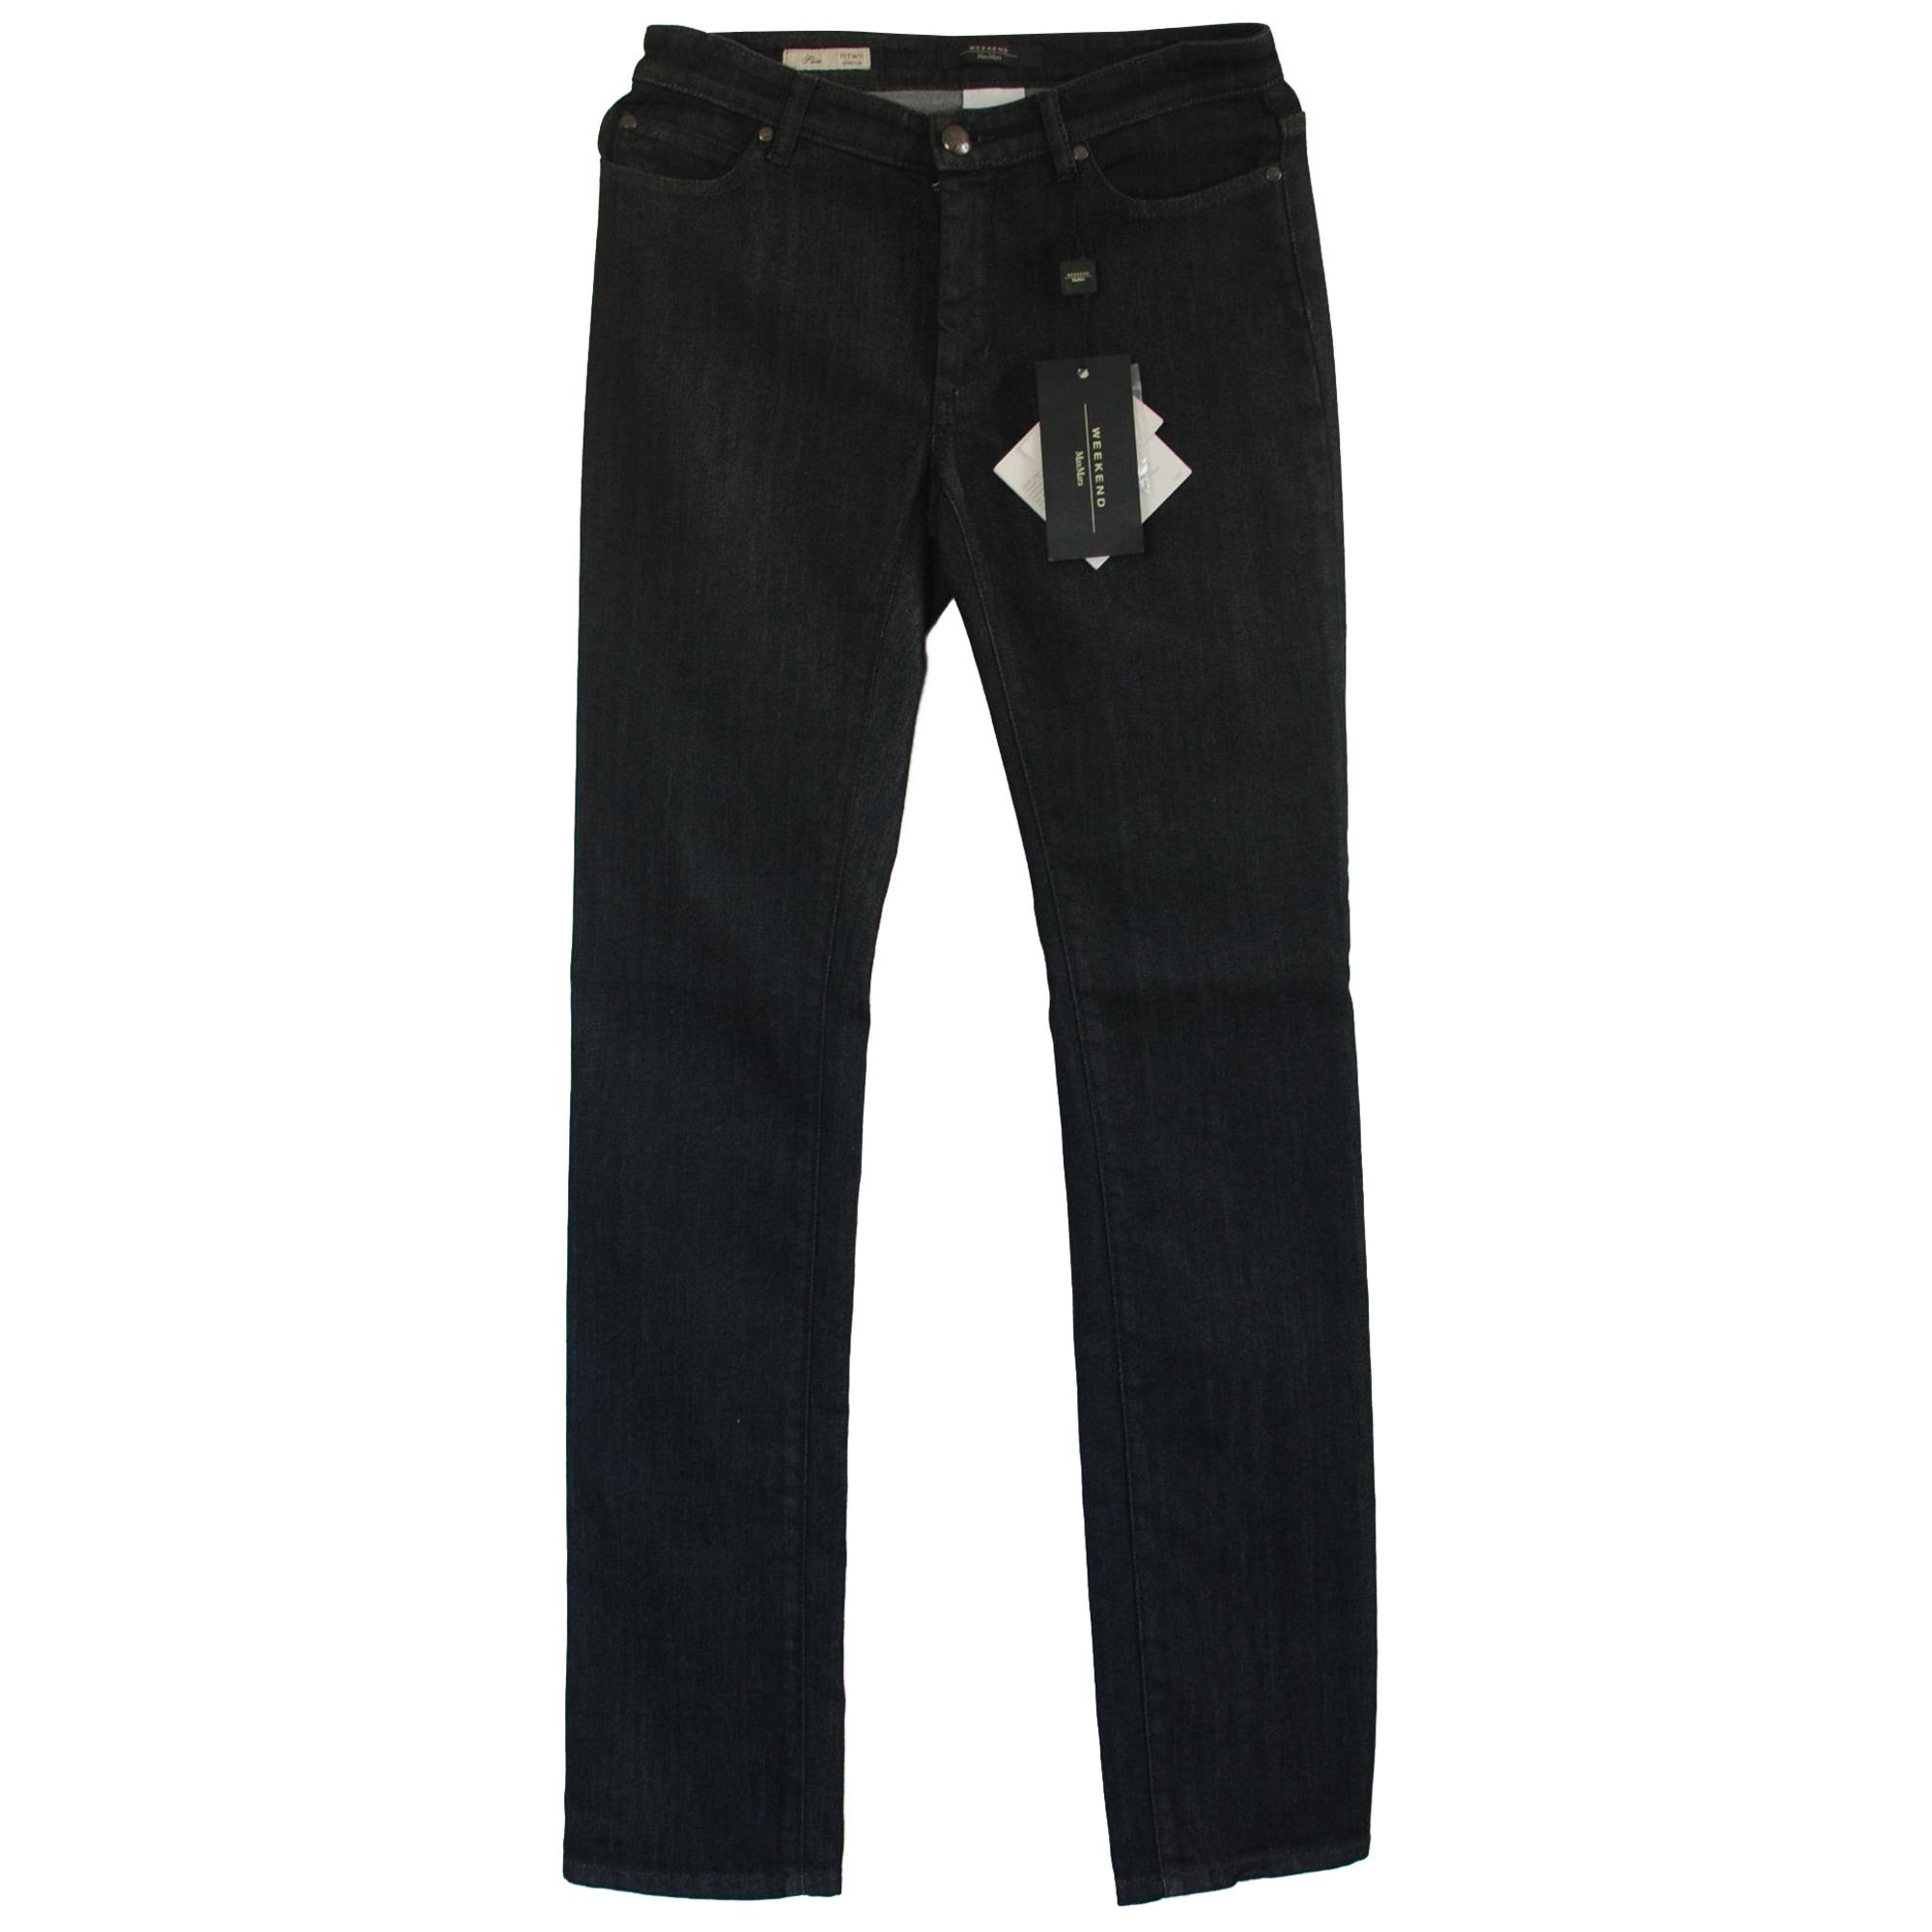 Jeans droit MAX MARA Gris, anthracite